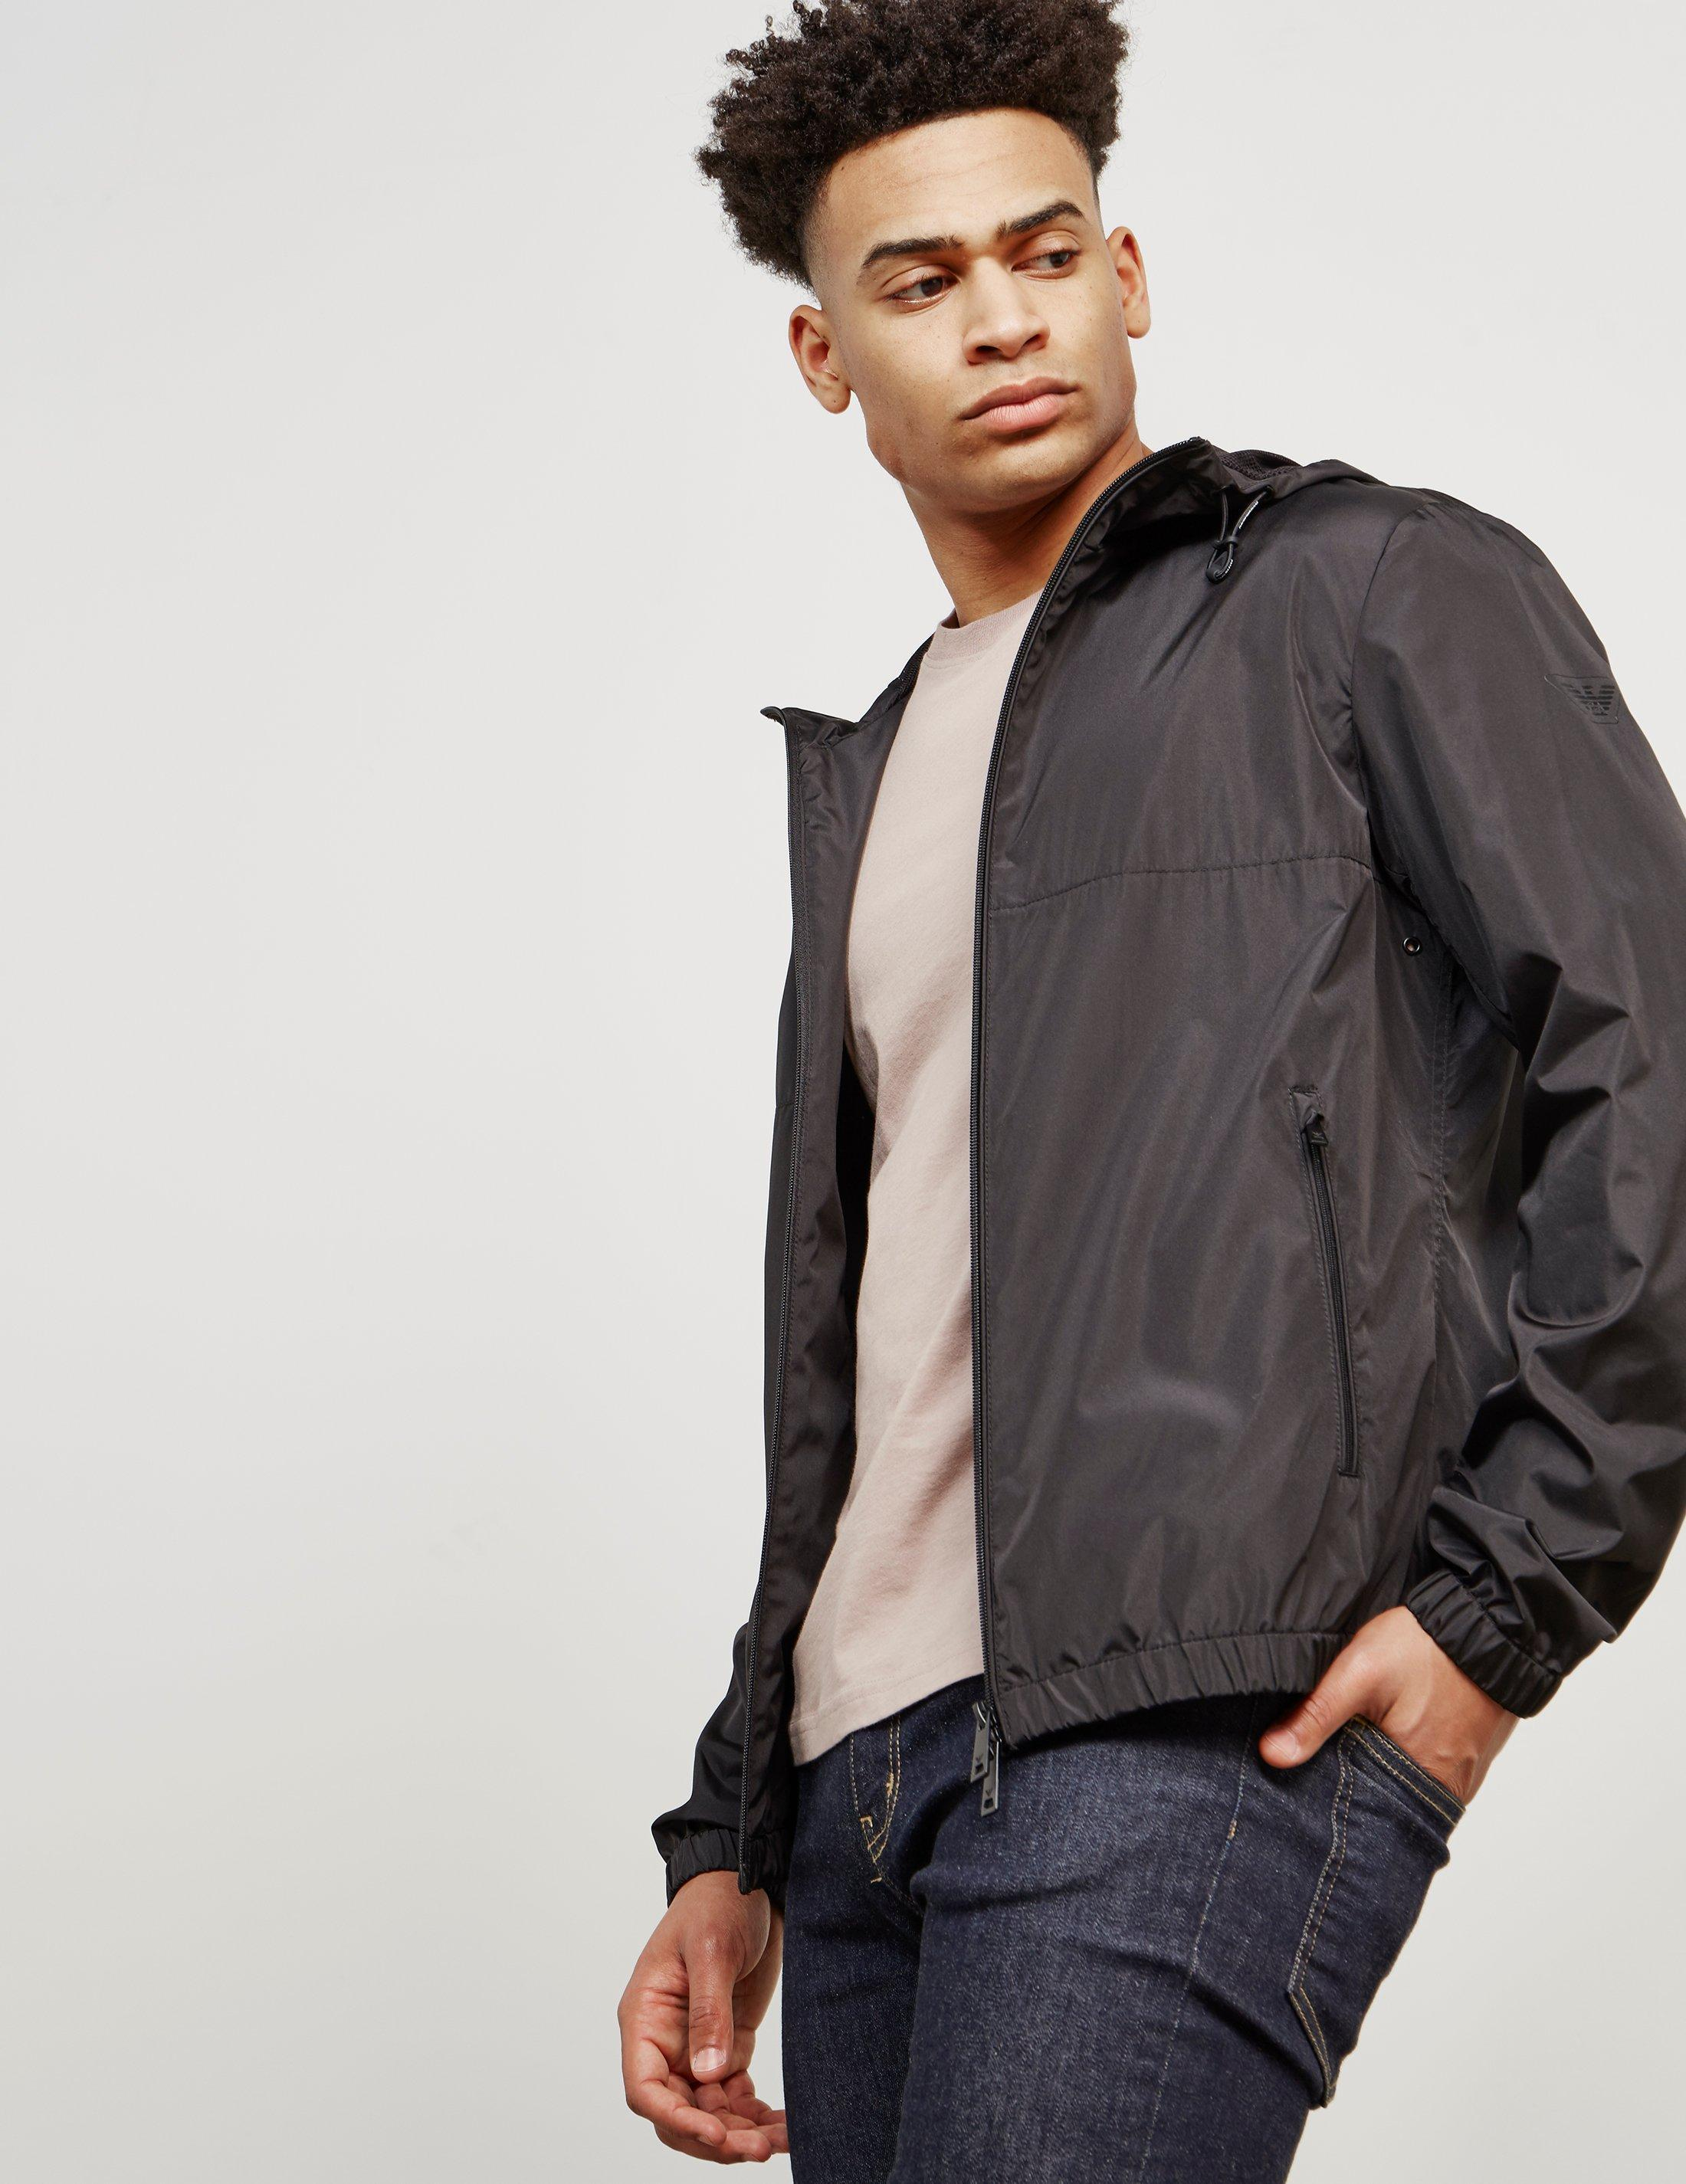 59aeb1bd86 Emporio Armani Hooded Cagoul Jacket - Online Exclusive Black for men